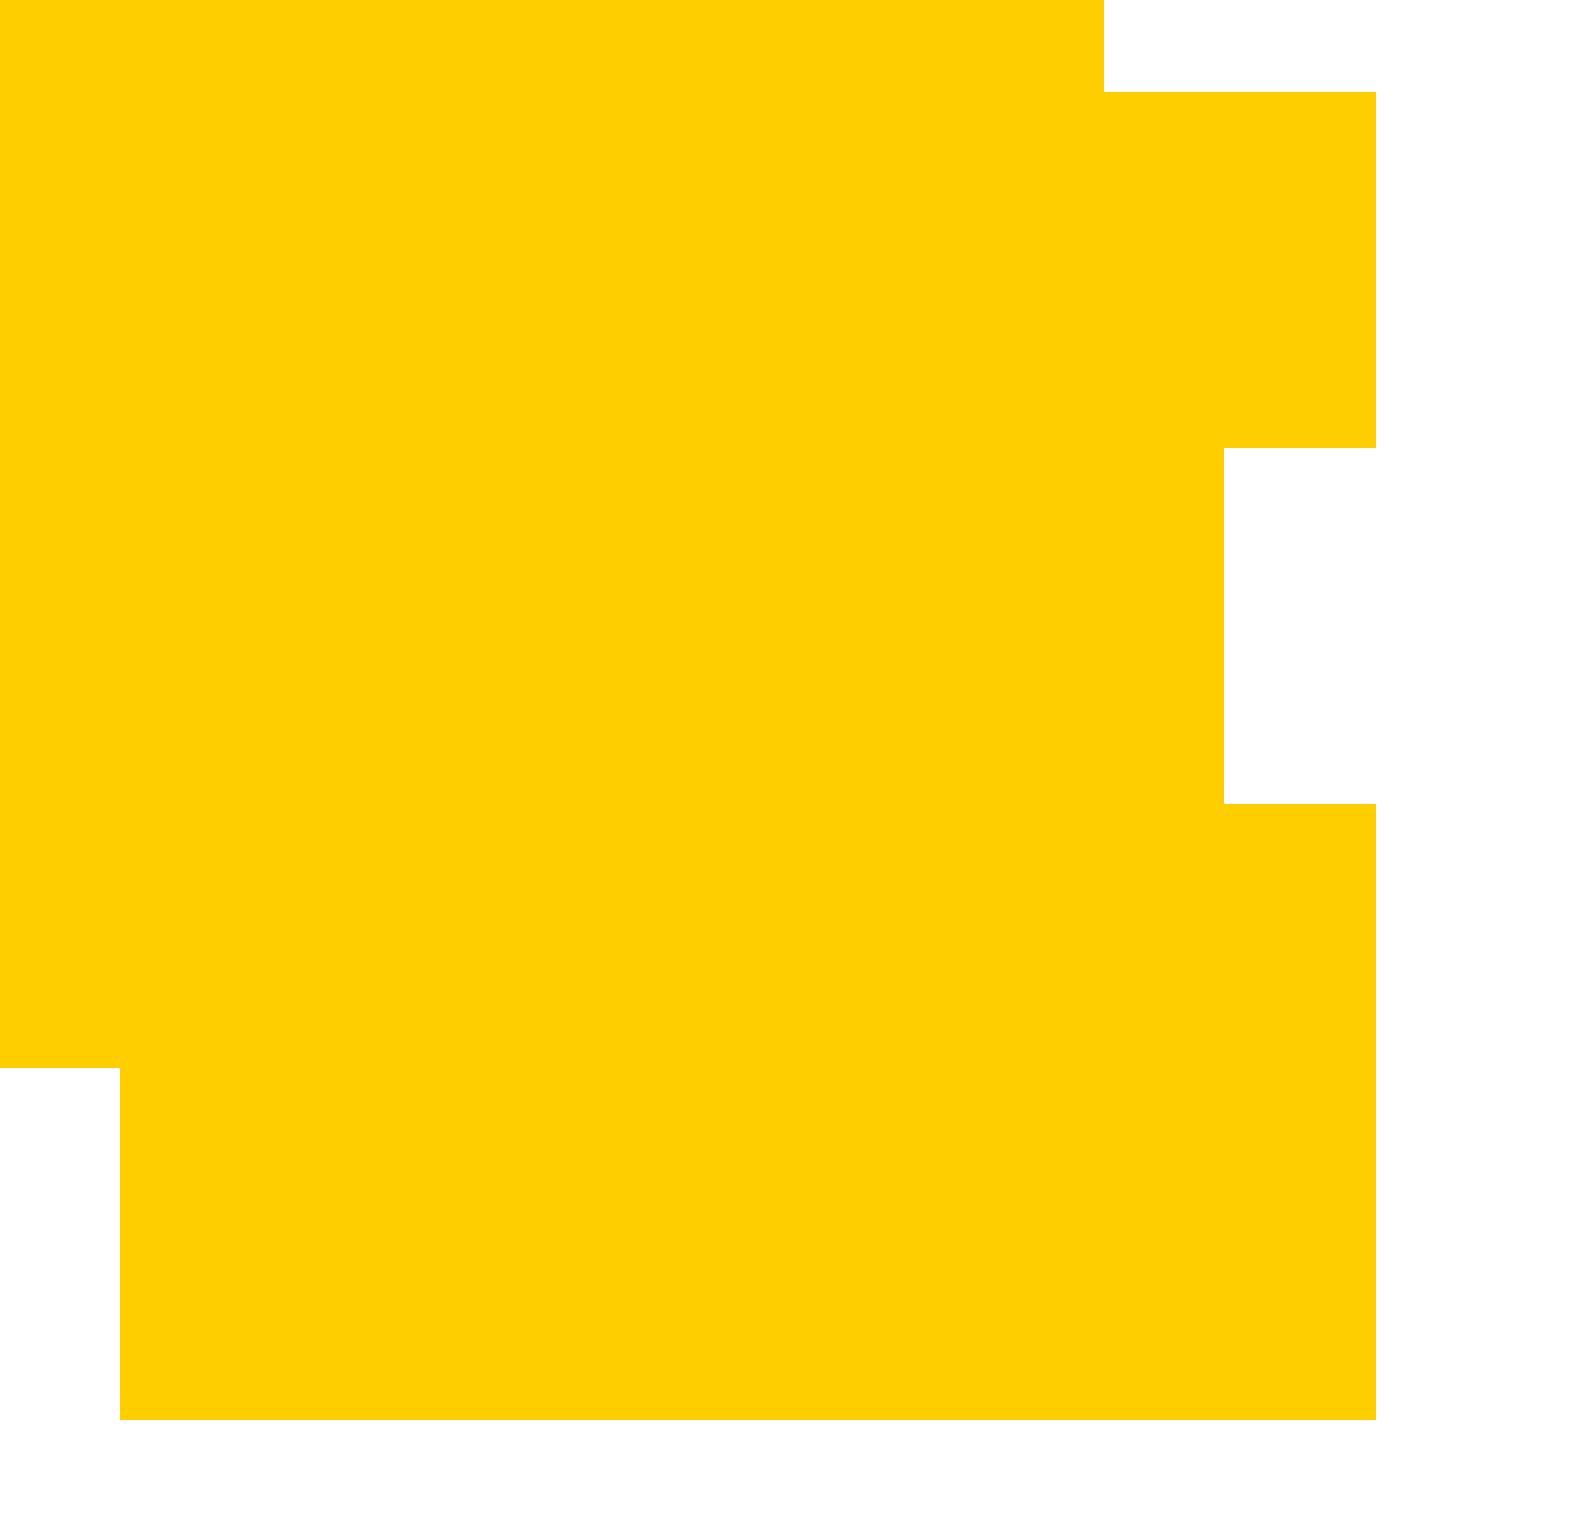 11/20